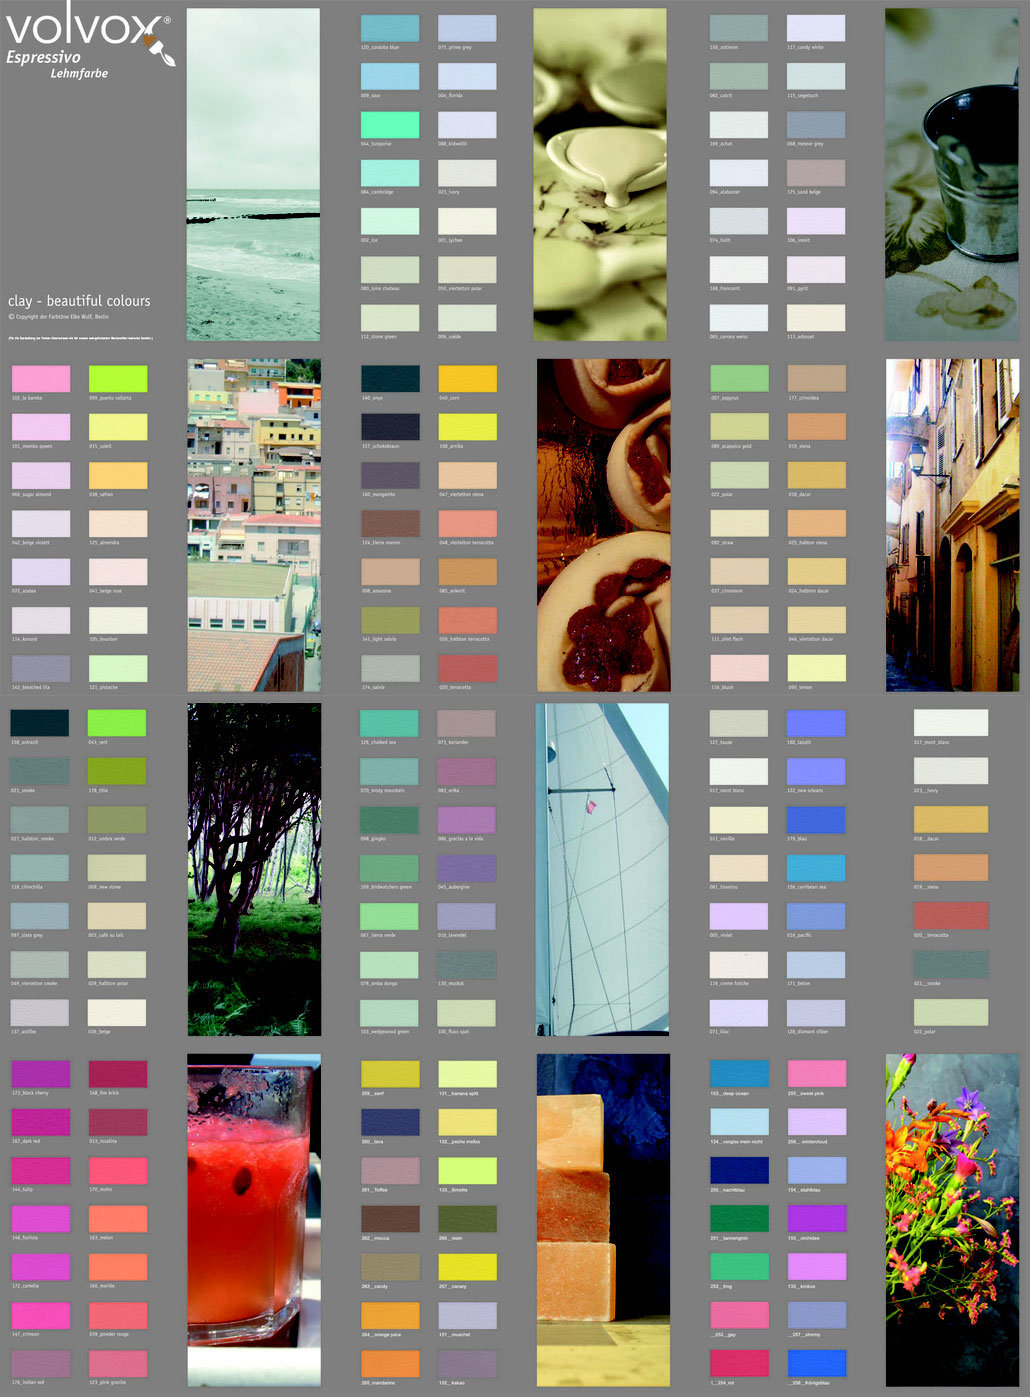 Farbmusterkarte Espressivo Leporello, Volvox